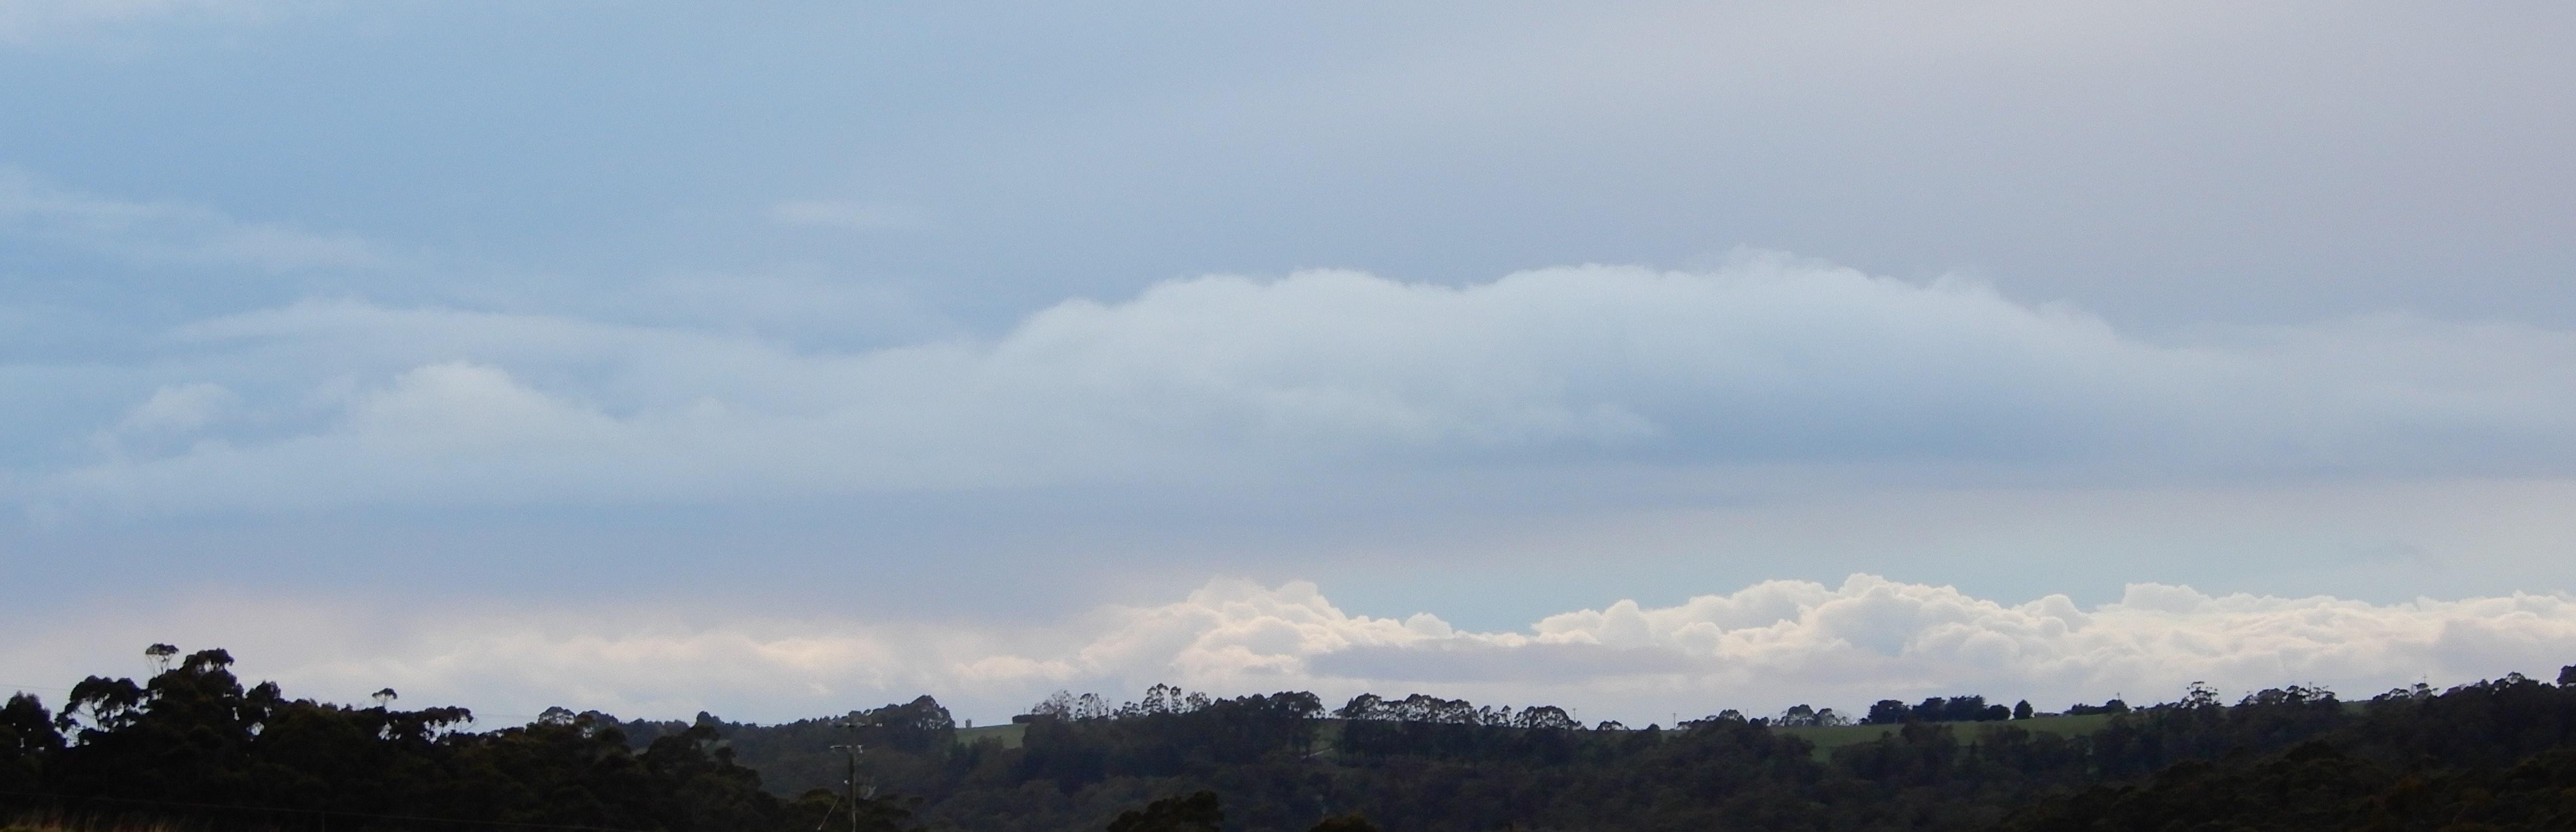 11.storm clouds